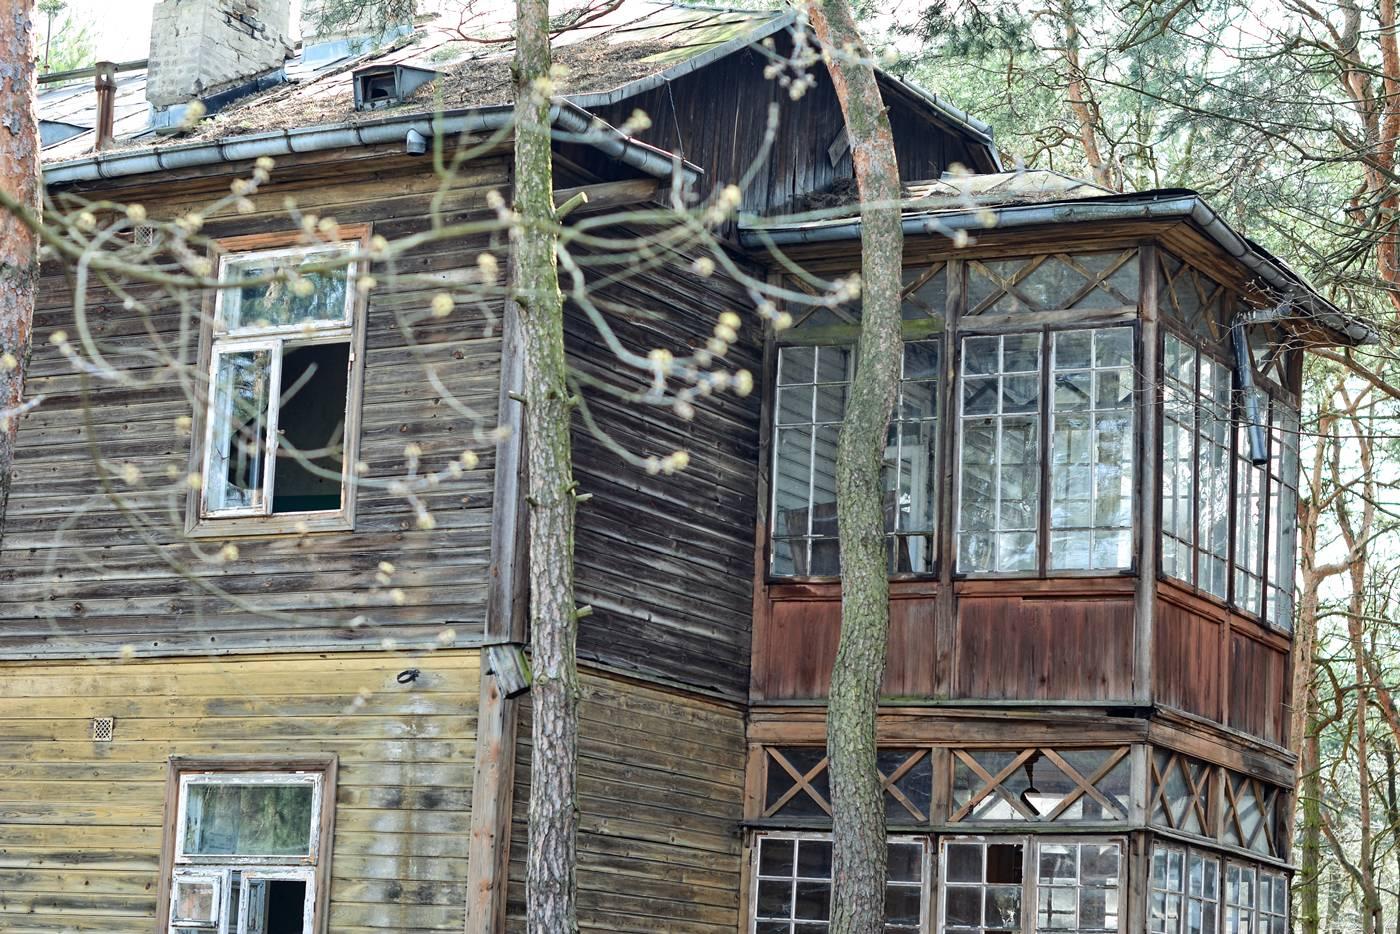 otwock jozefow wooden architecture swidermajer